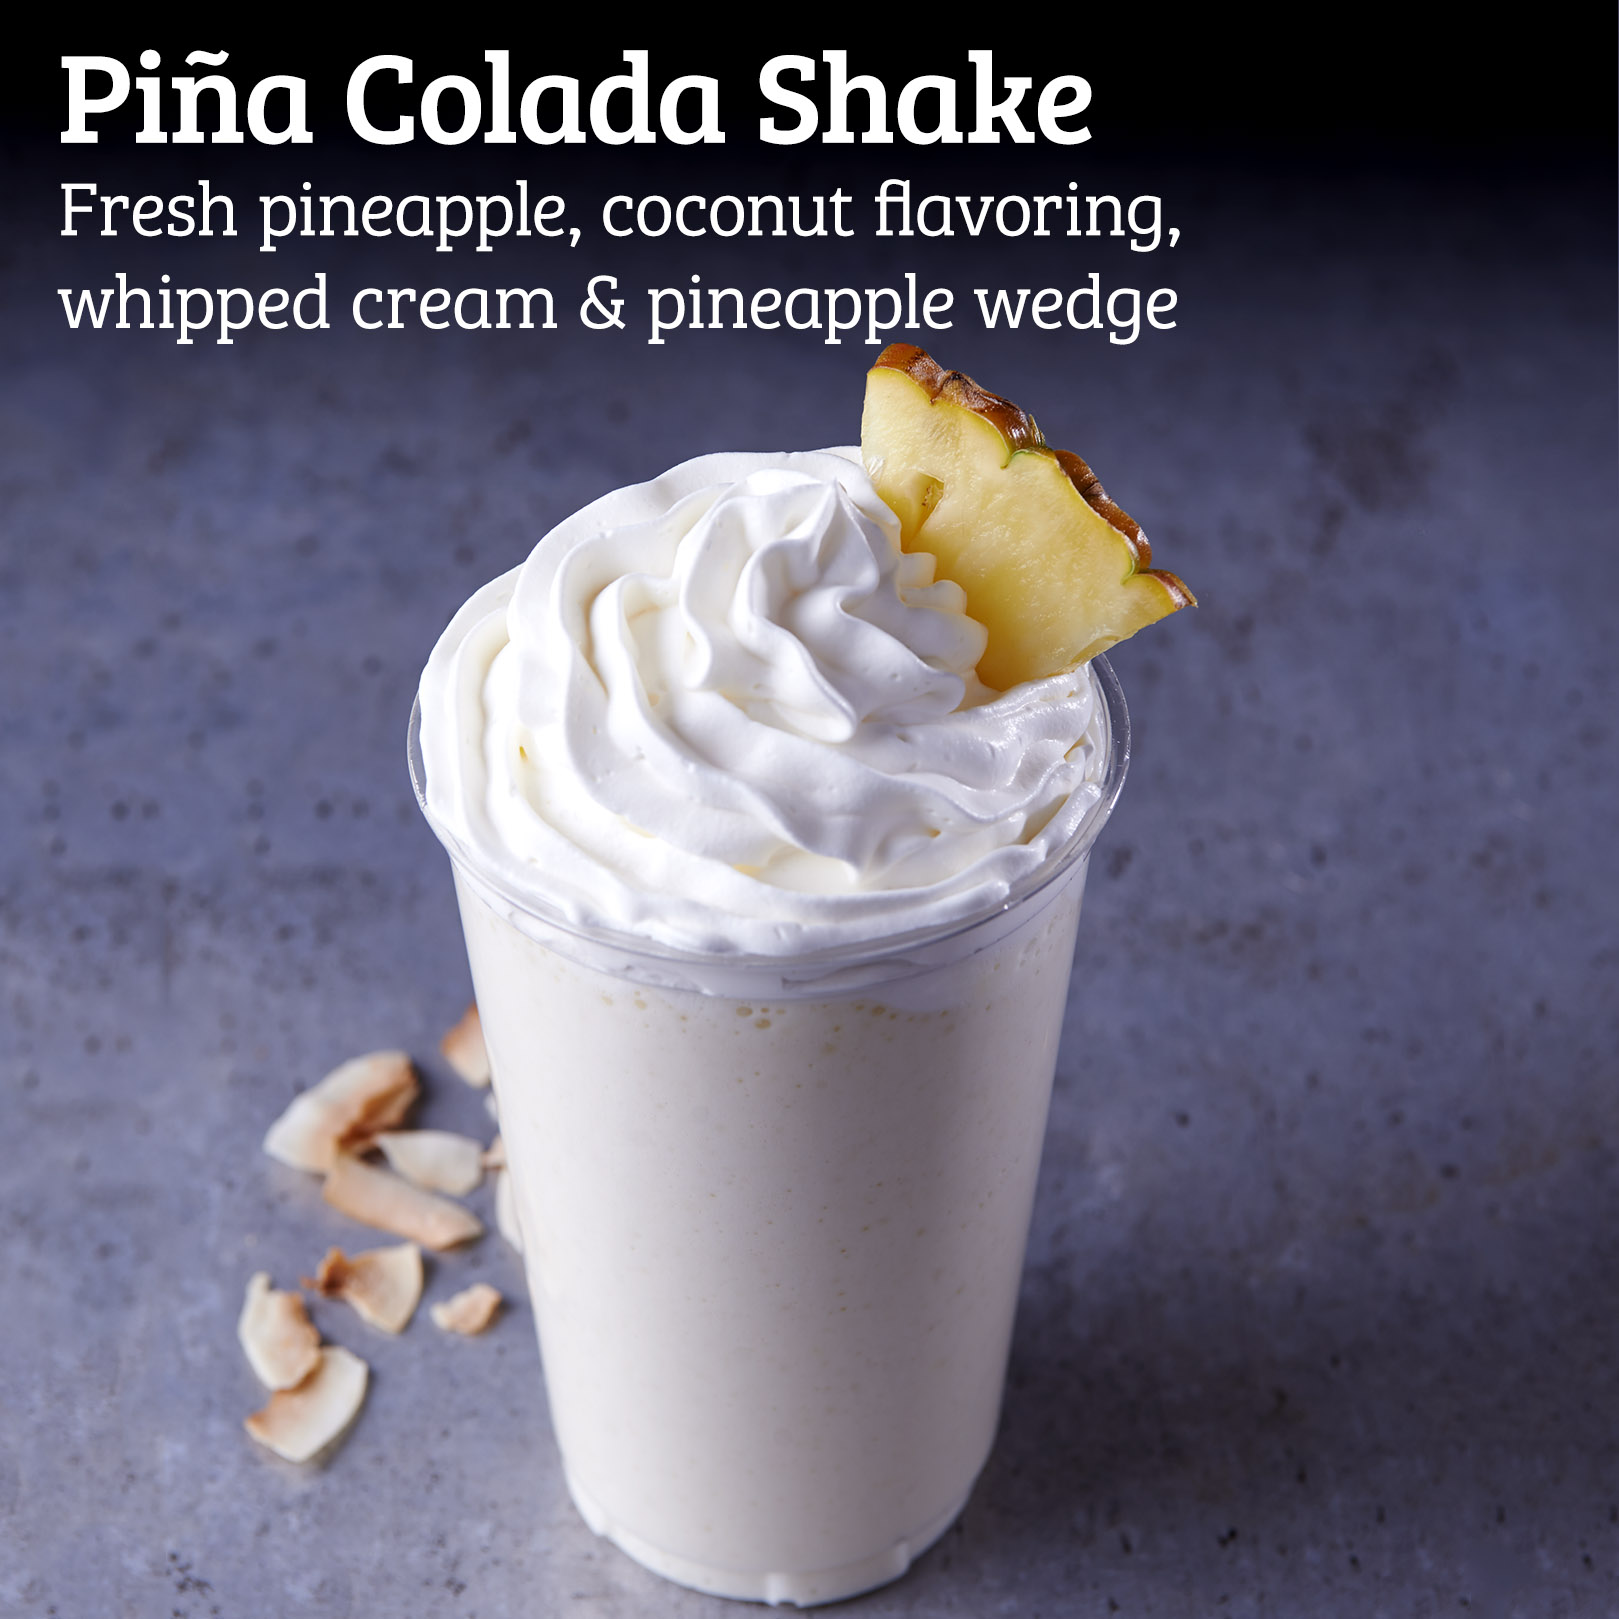 Kidd Valley Piña Colada Shake